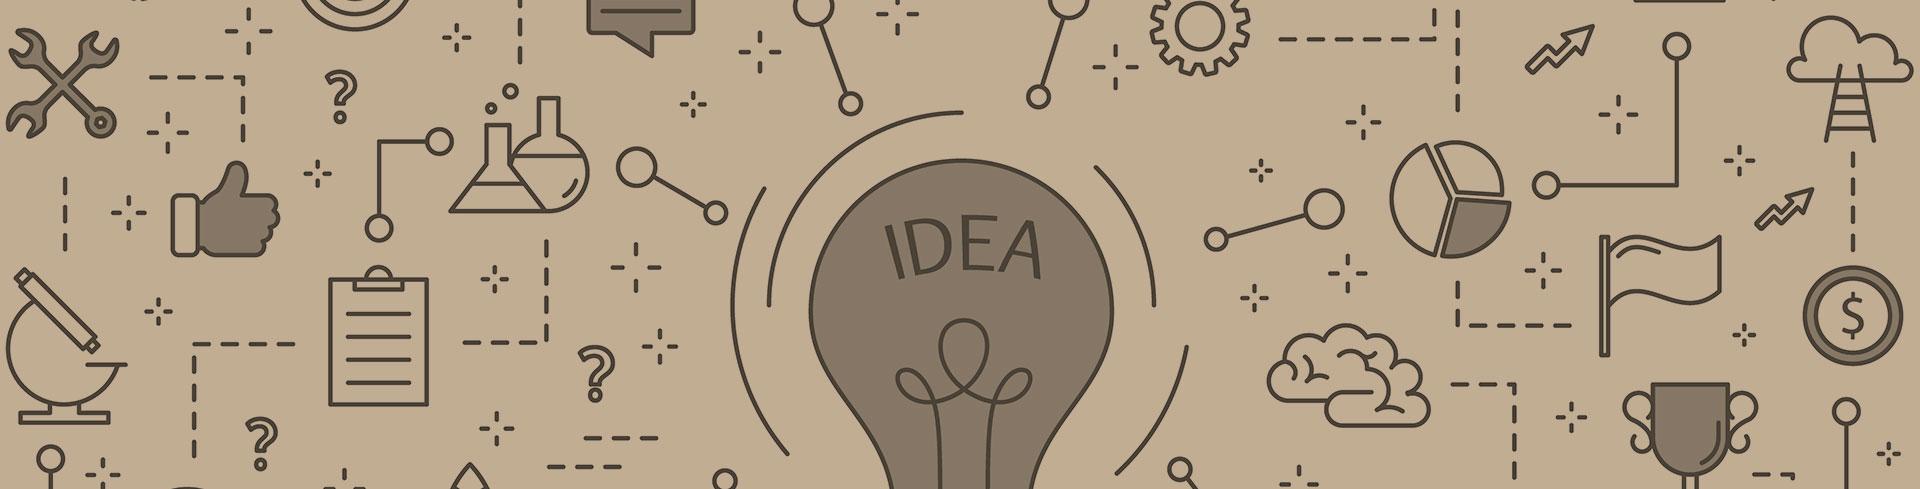 Design Thinking para la innovación social